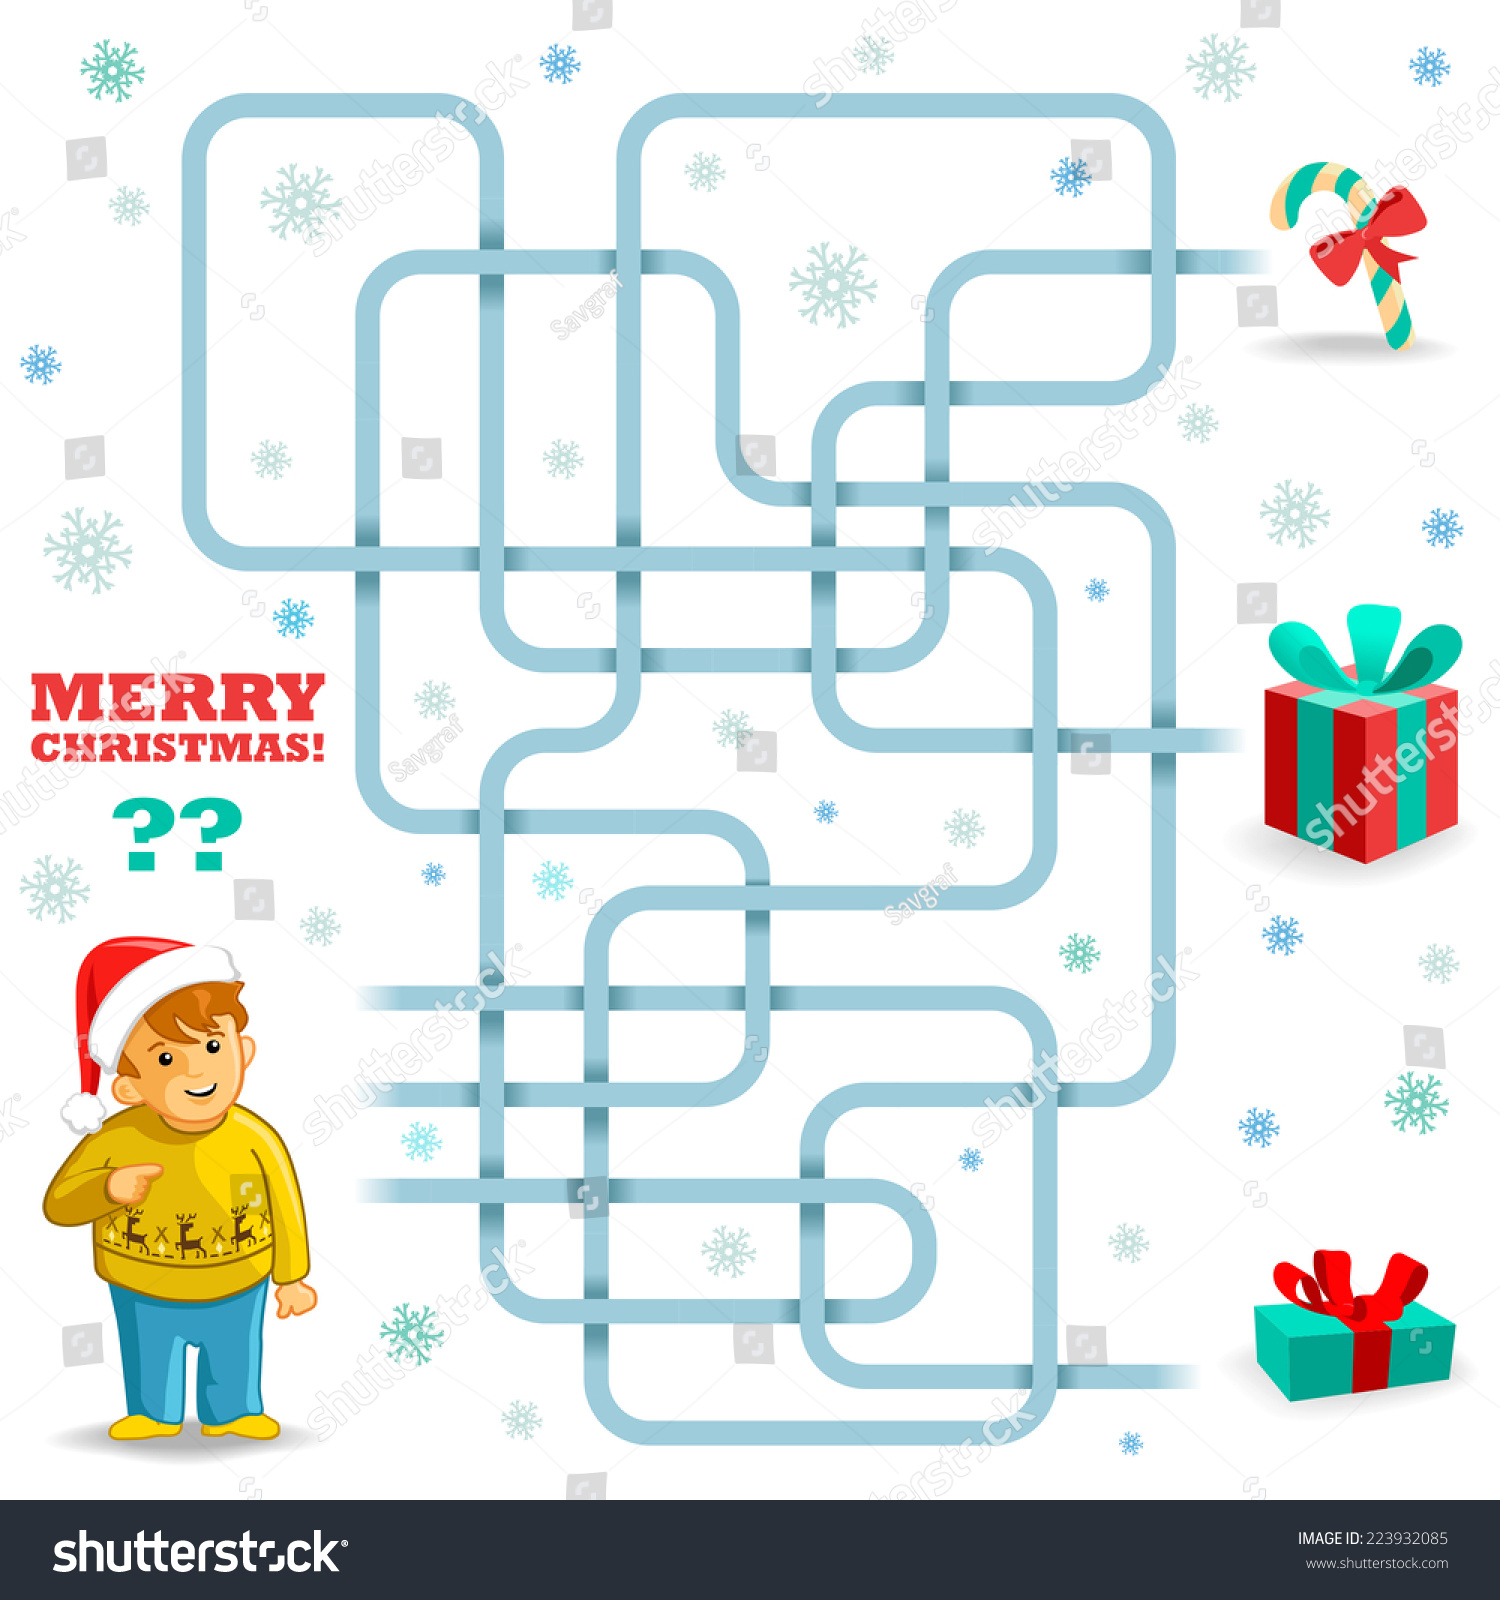 Funny Christmas Maze Game Boy Needs Stock Vector (Royalty Free ...